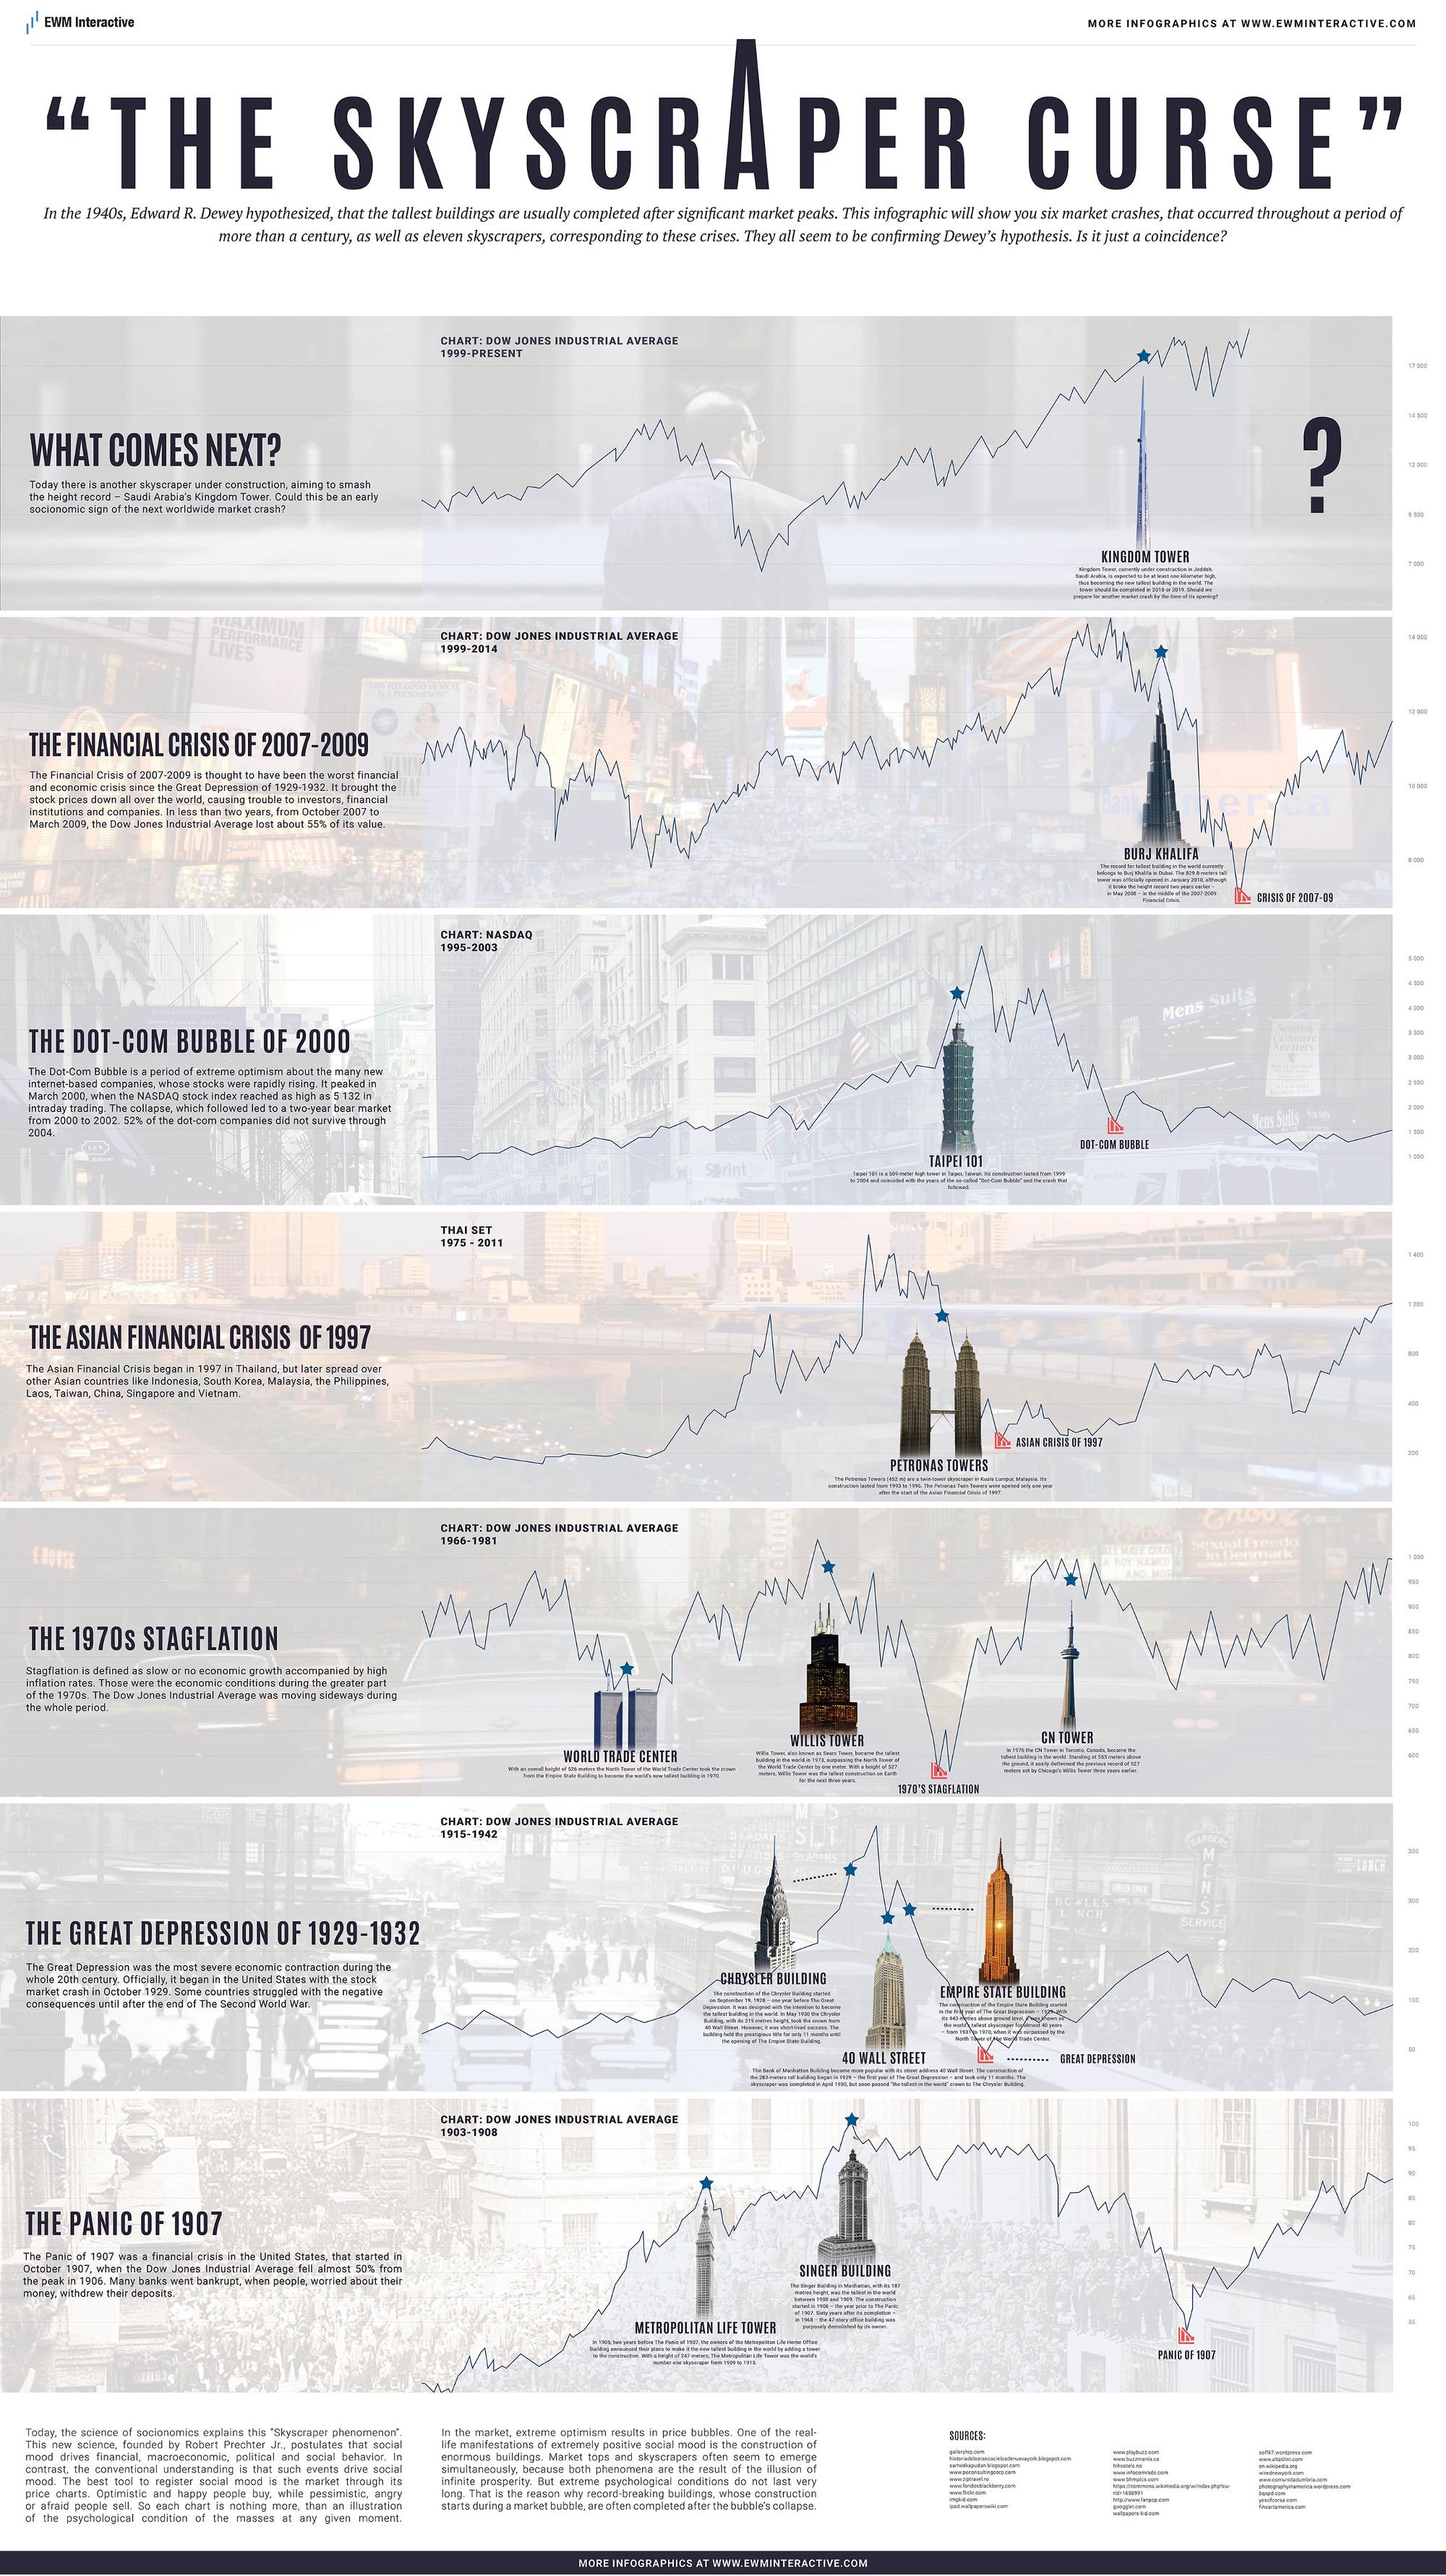 Skyskrapers and crises